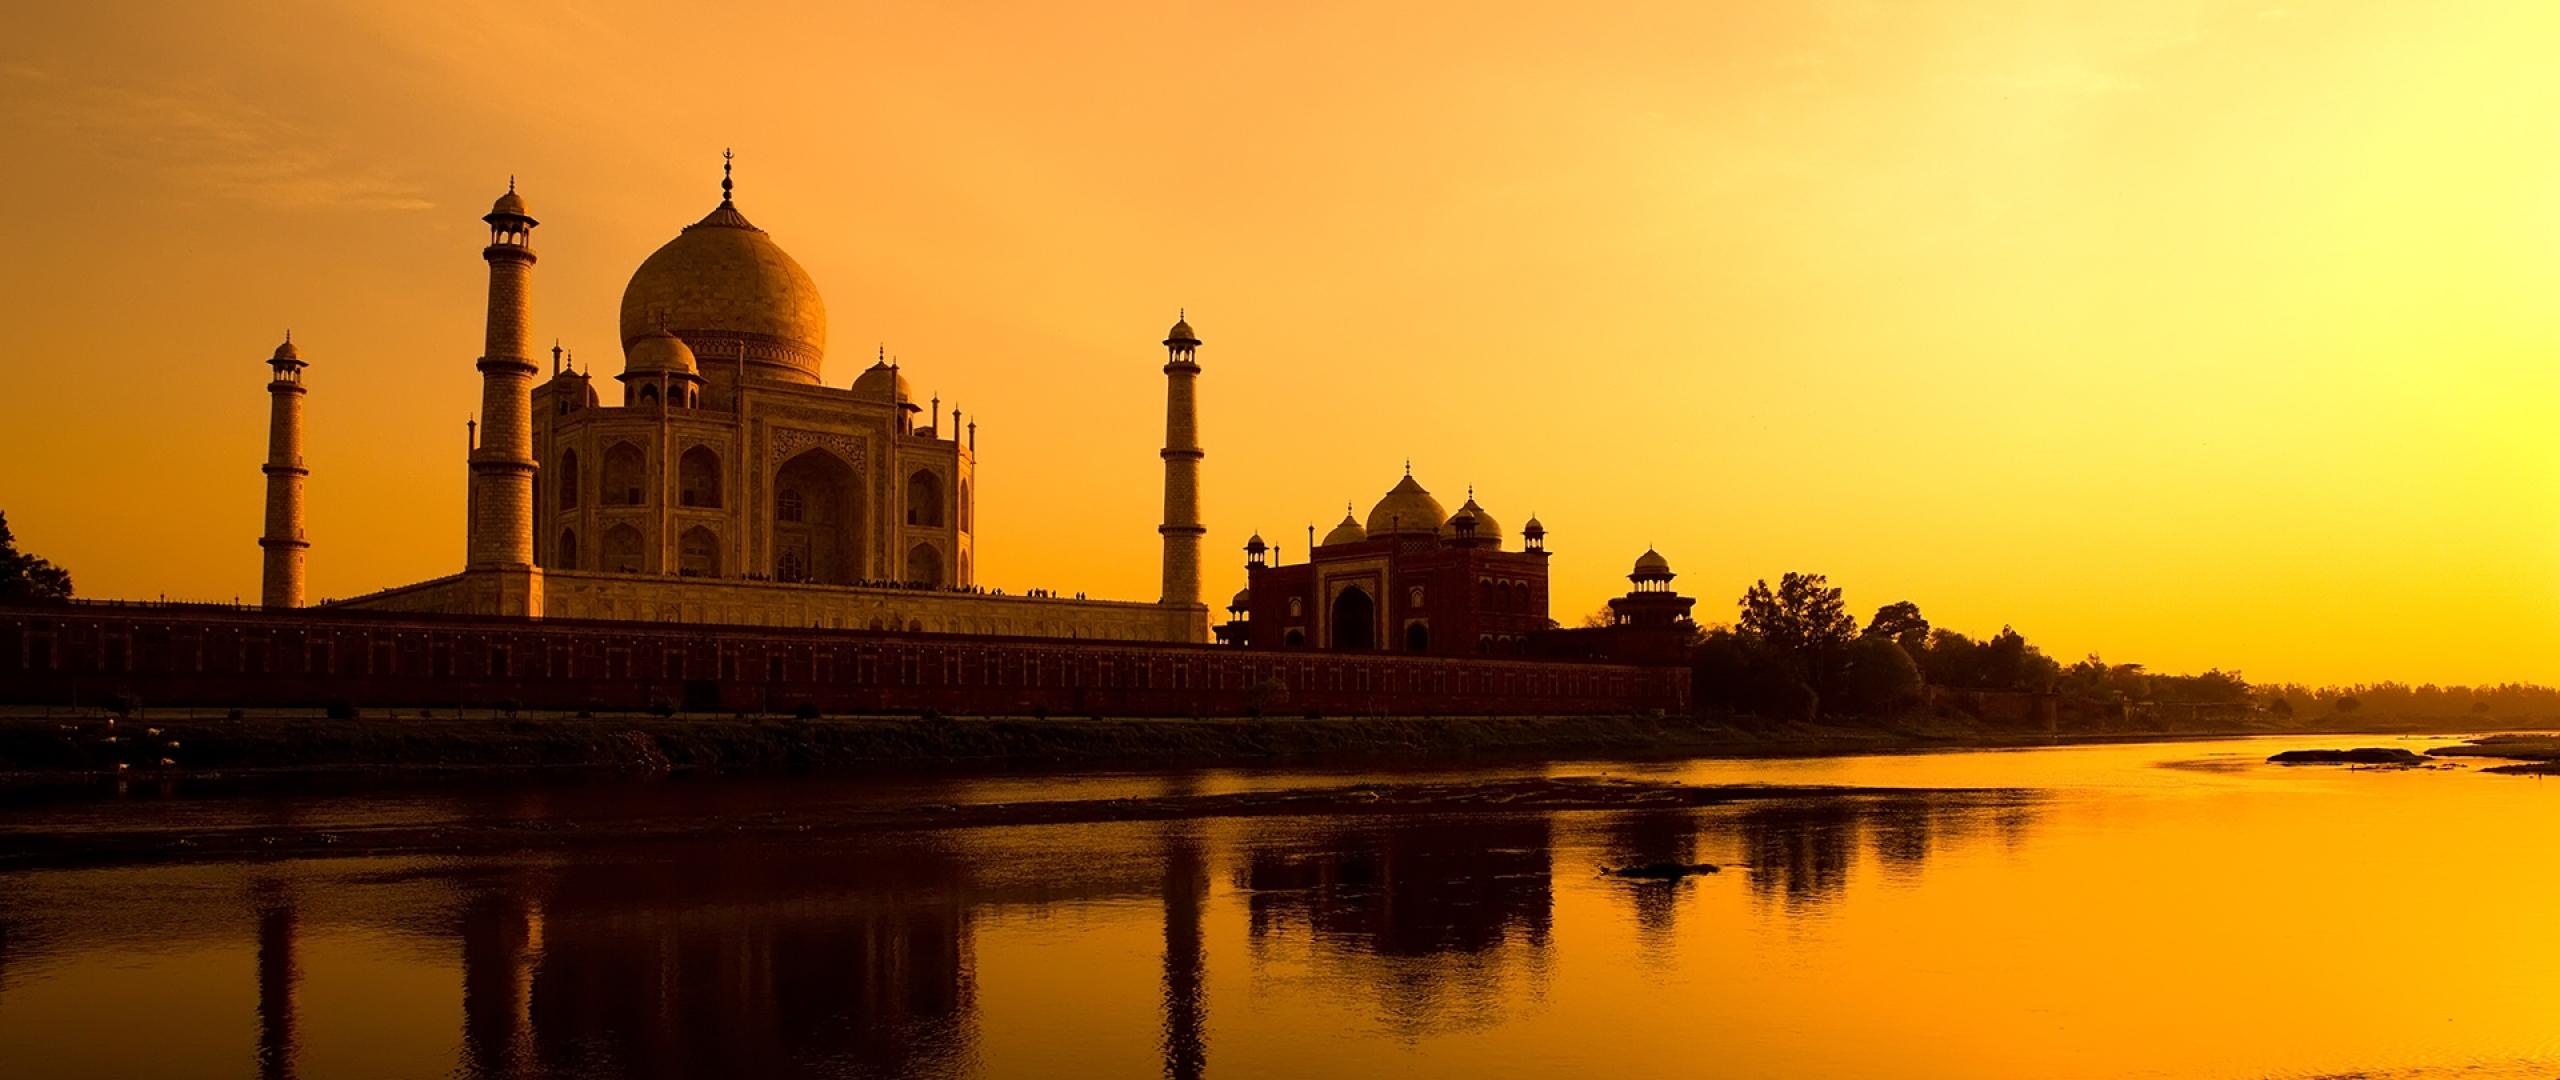 taj_mahal_india_structure_landmark_63163_2560x1080